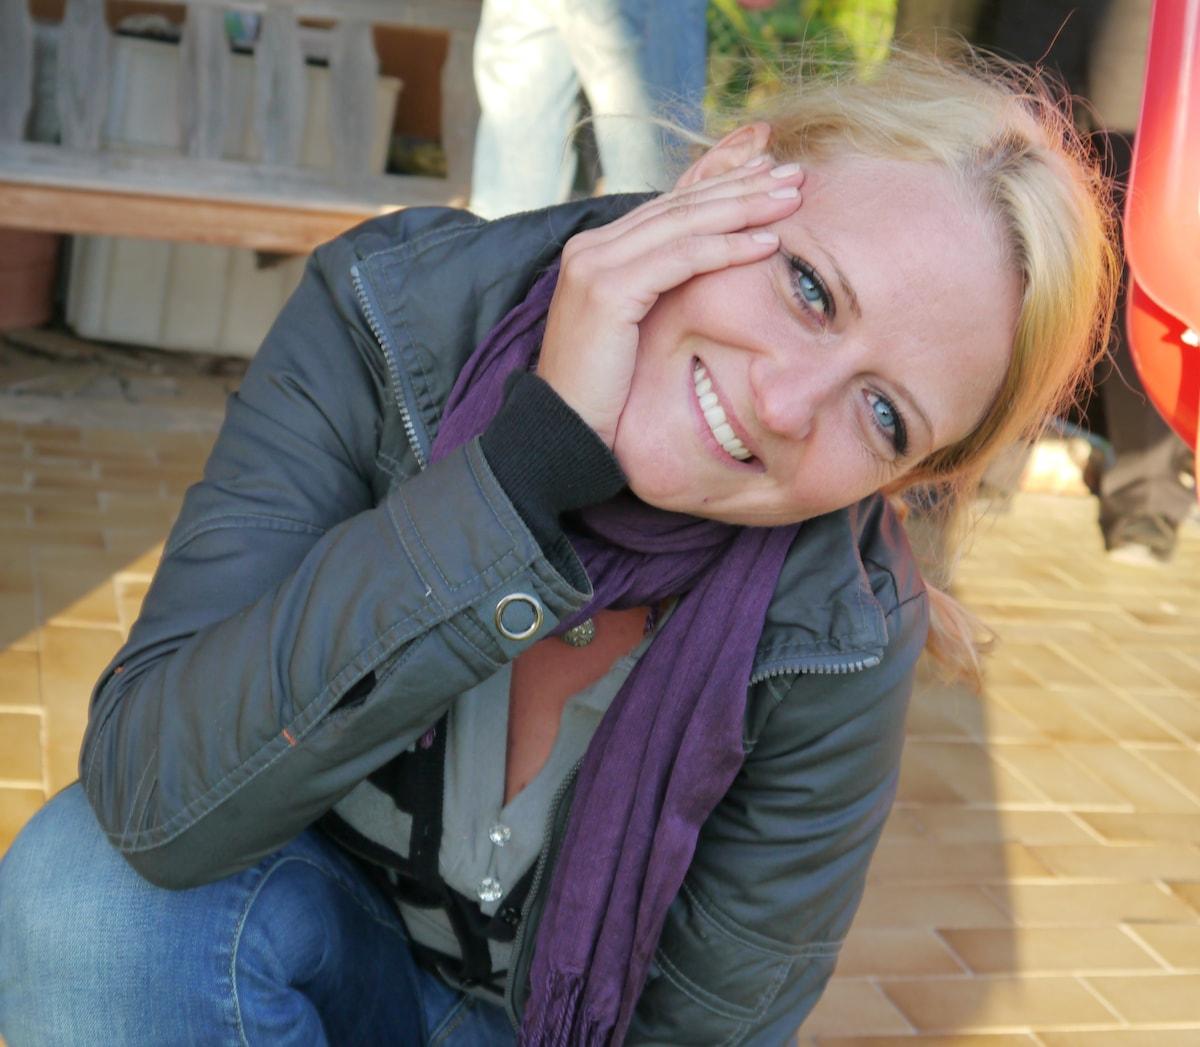 Anna from Hanover